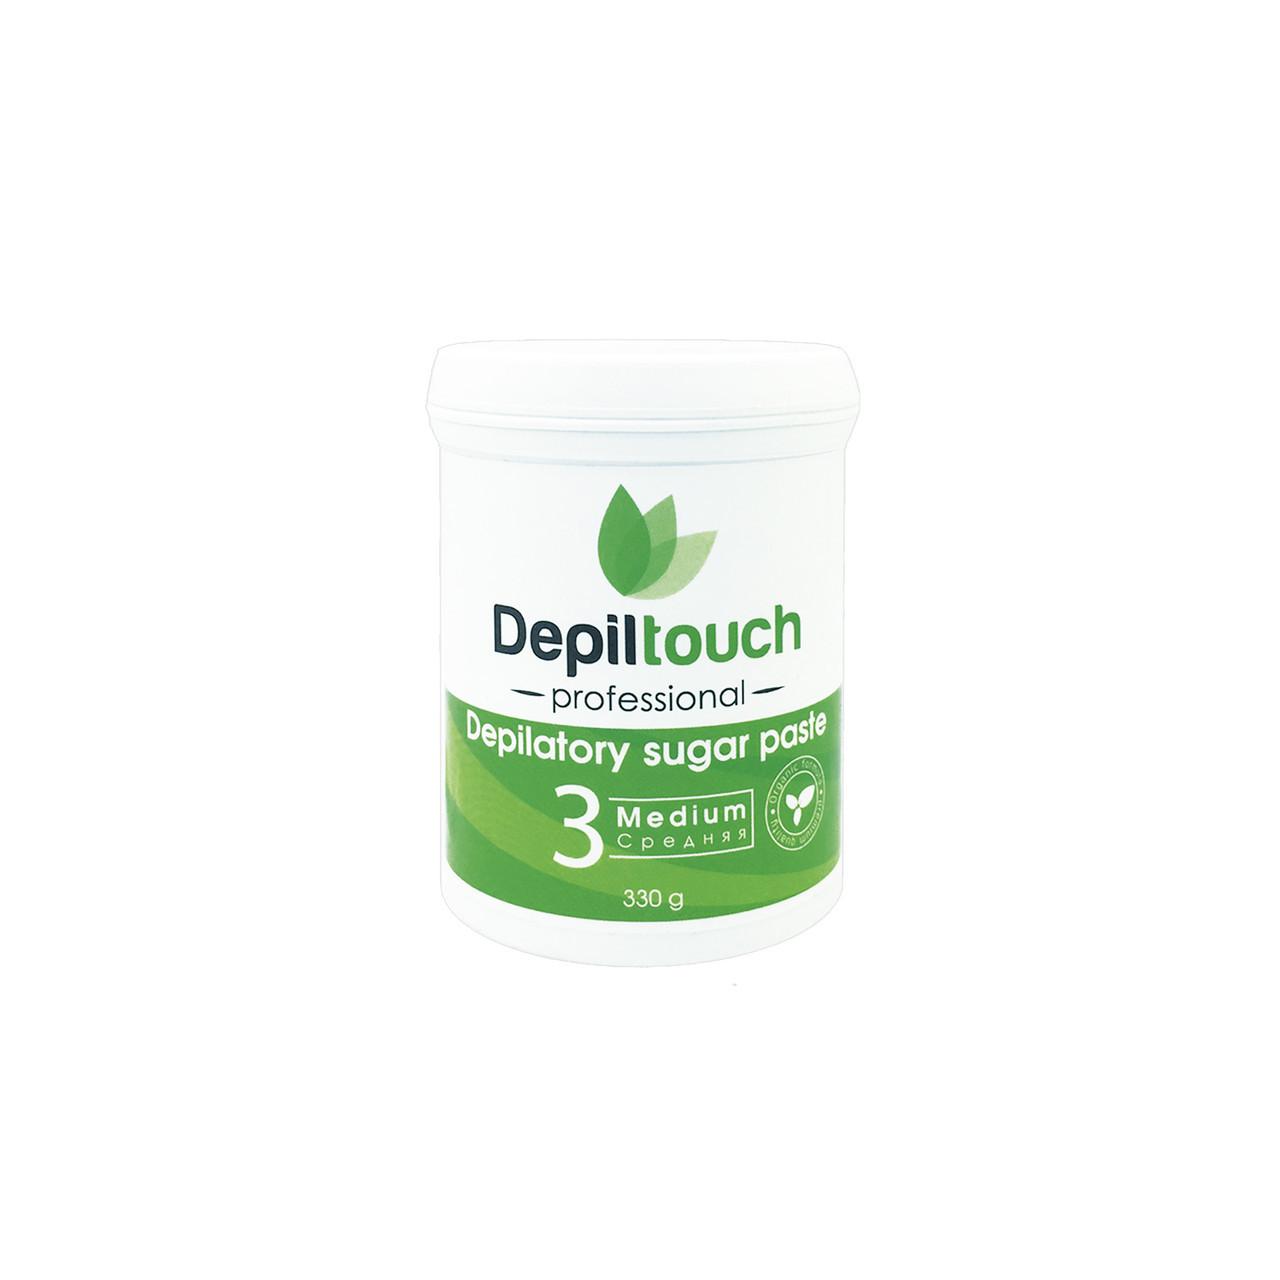 Сахарная паста для депиляции средняя Depiltouch Professional 330g